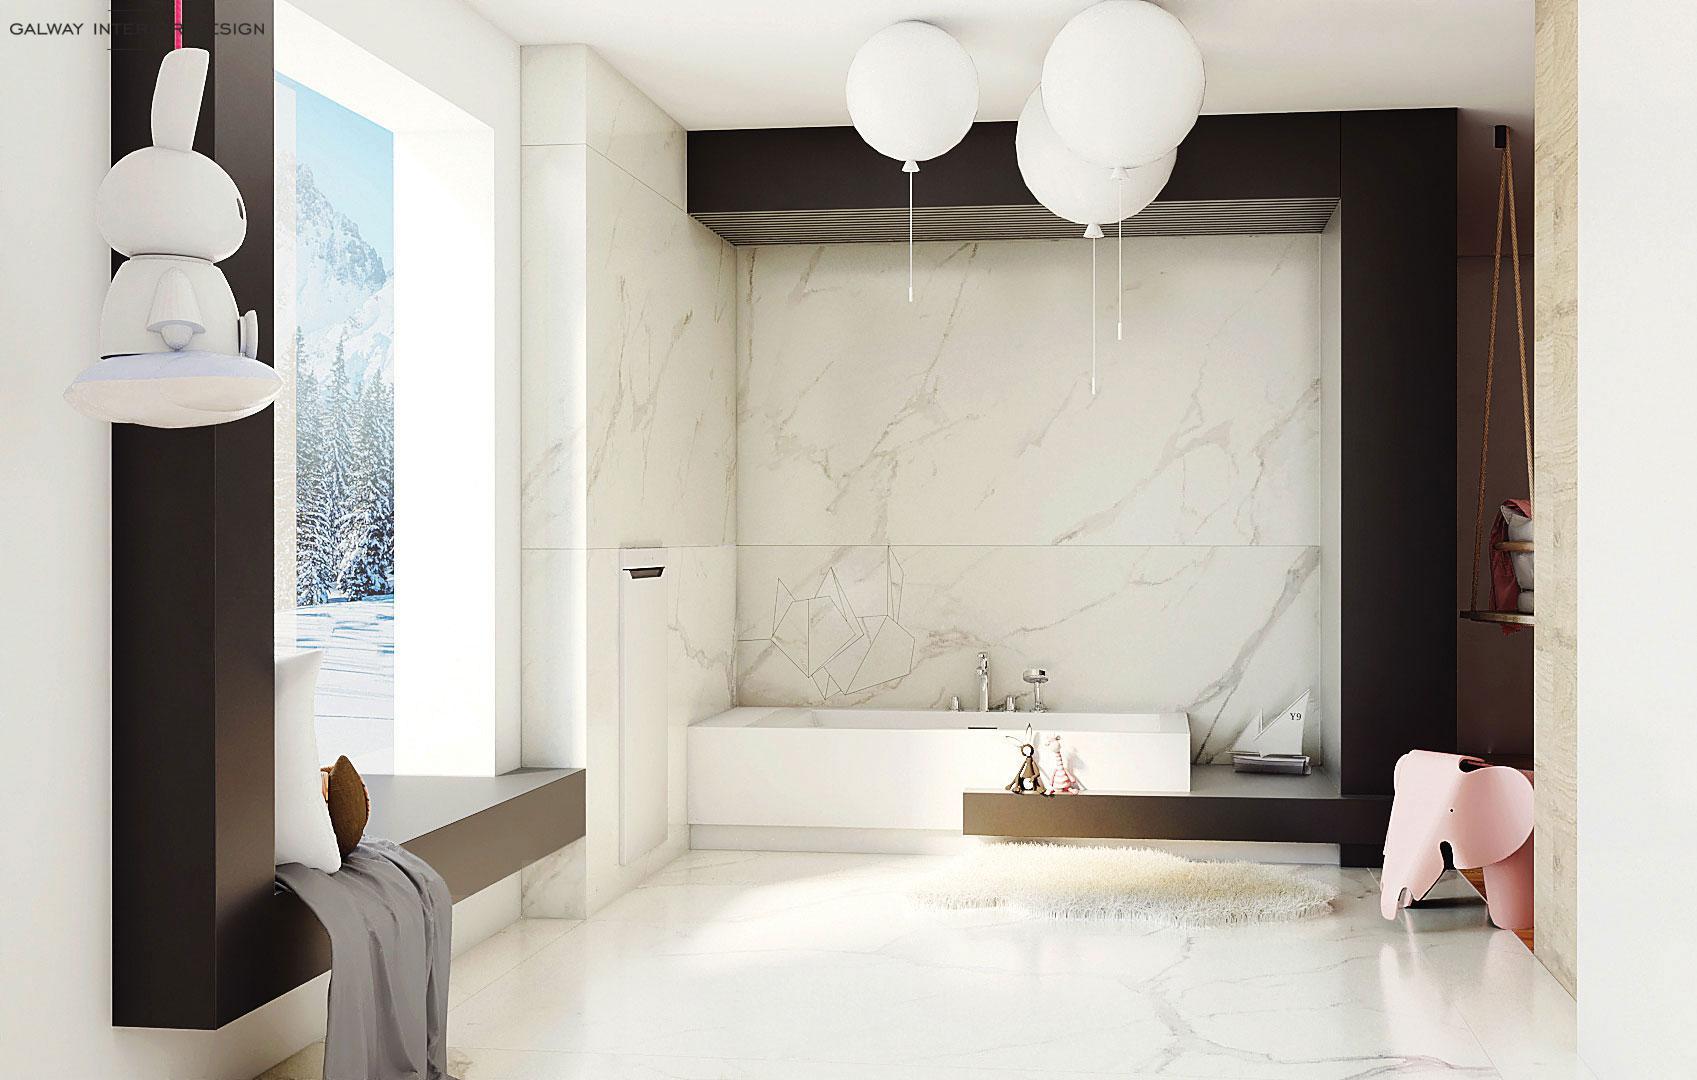 Galway Interior Design - Elegant Kids Bathroom Idea